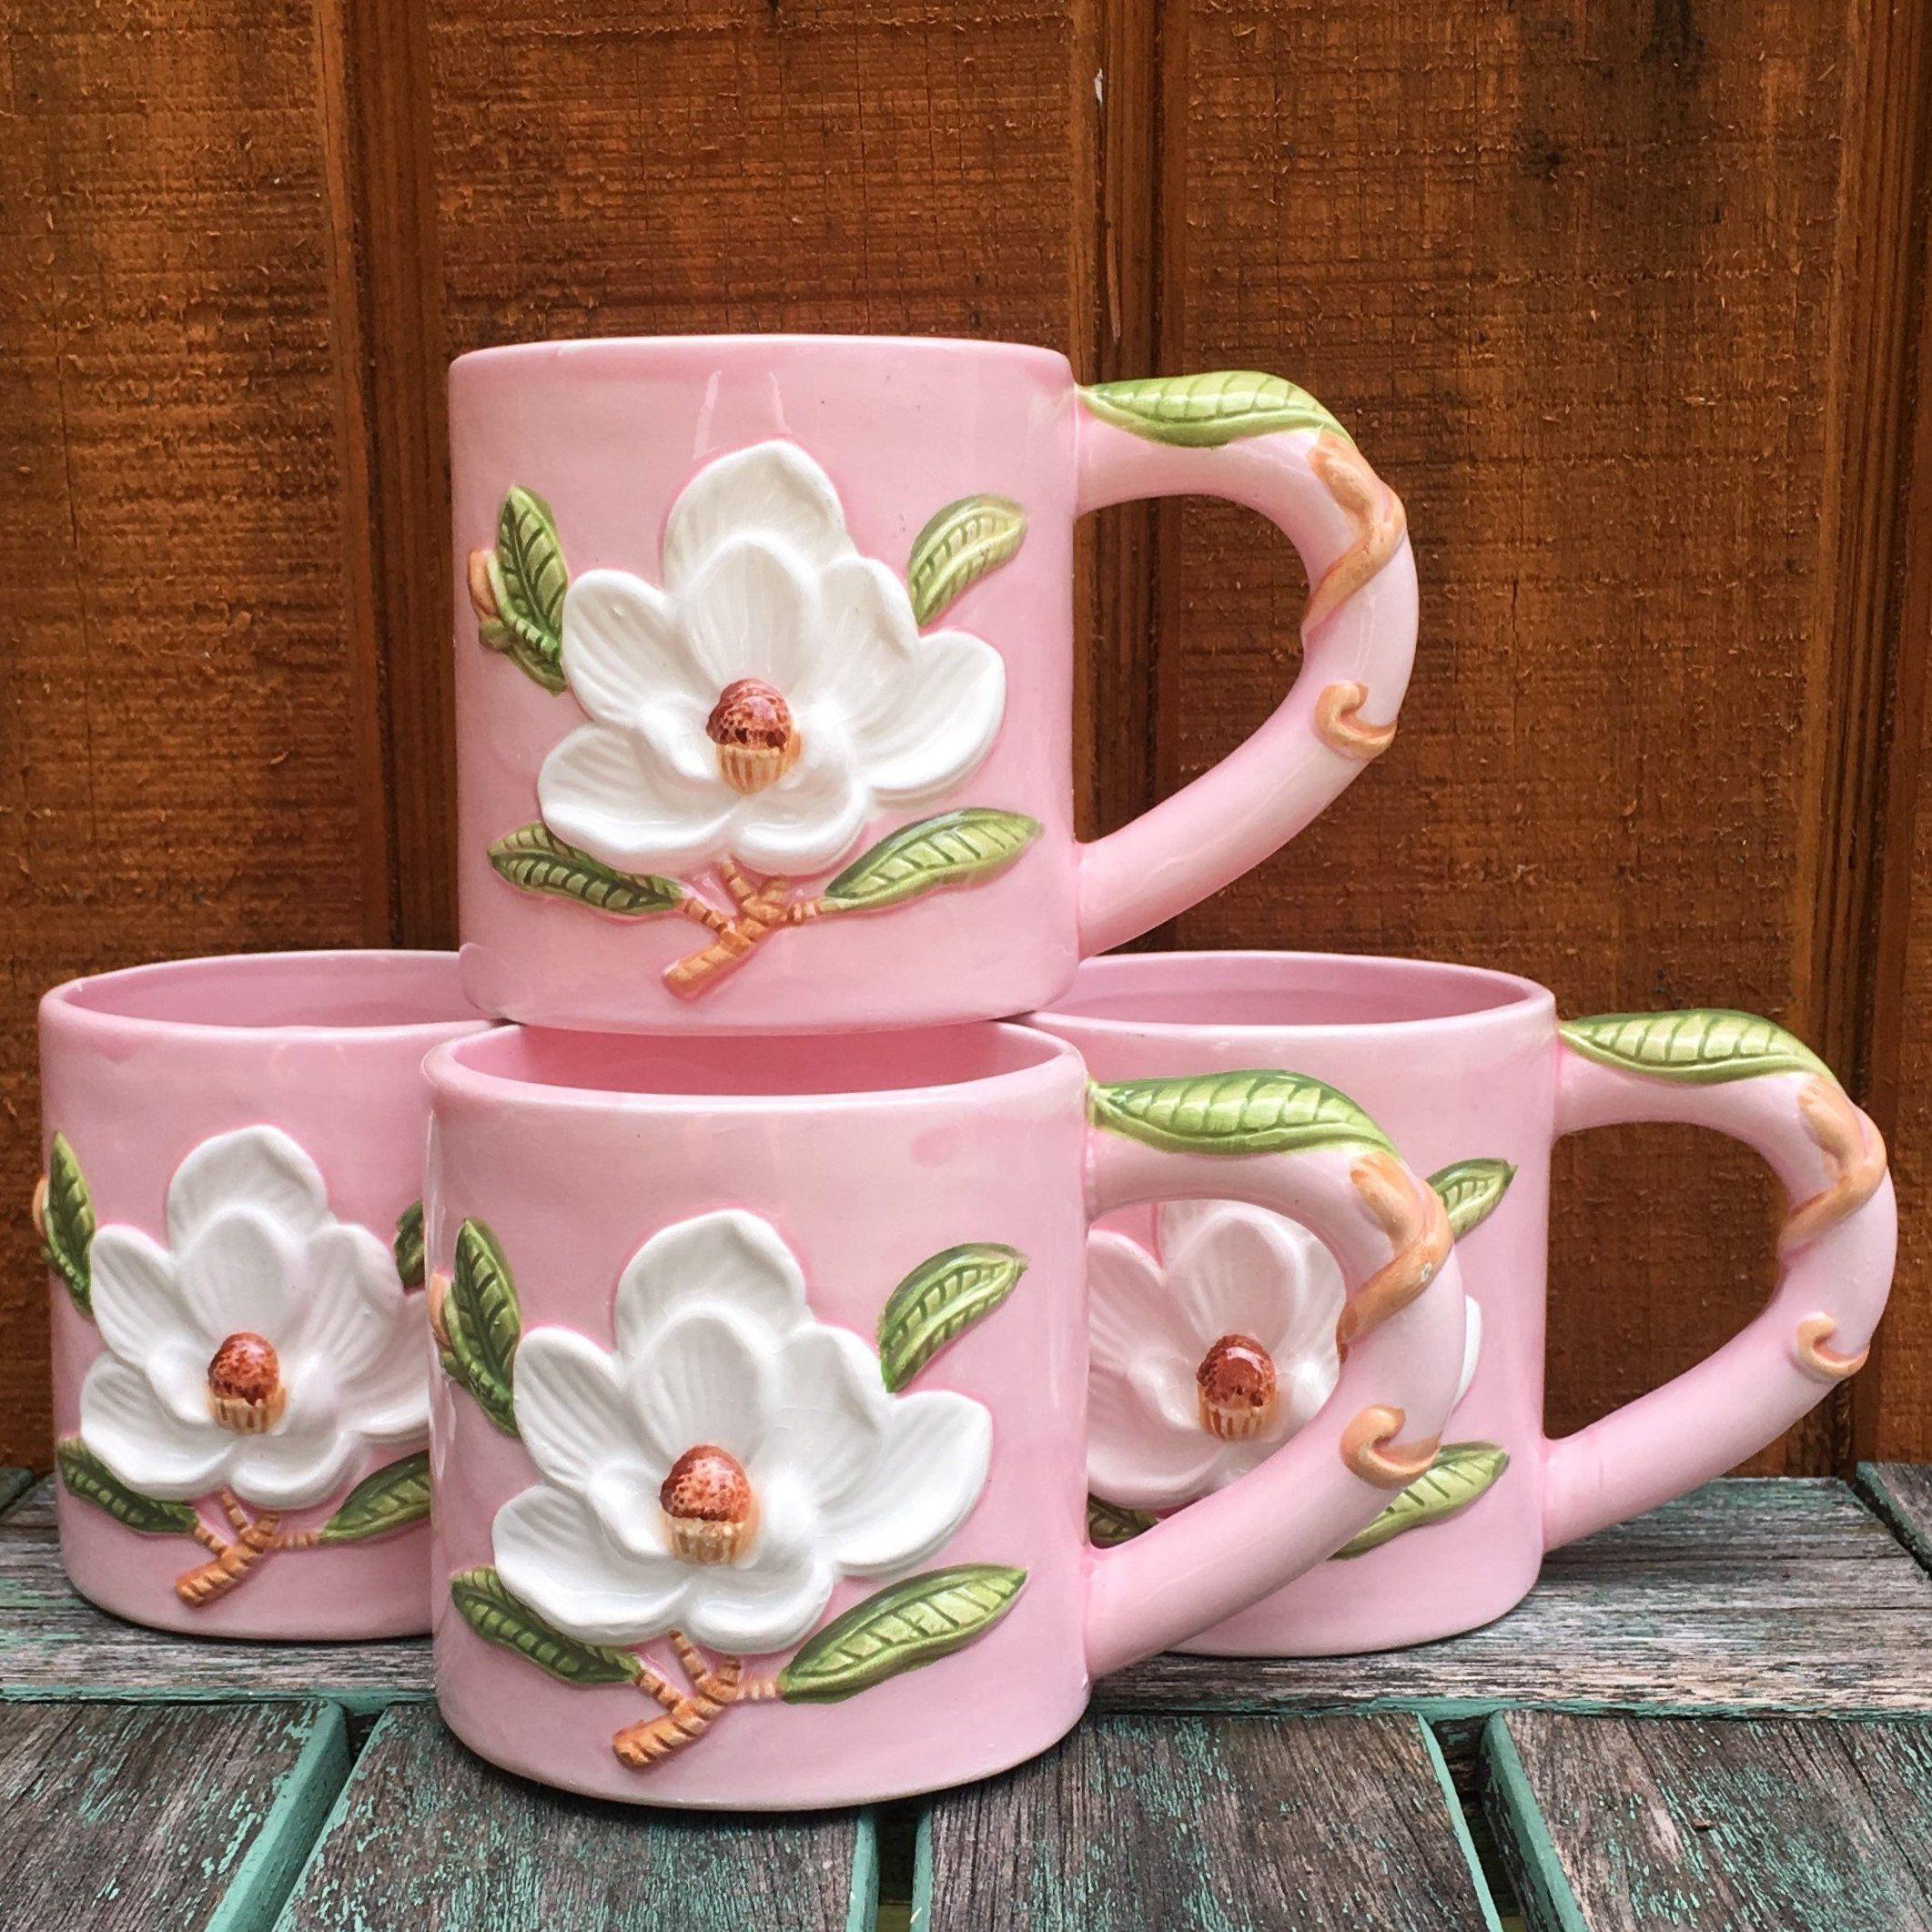 4pc ceramic pink coffee mug set with 3d magnolia design